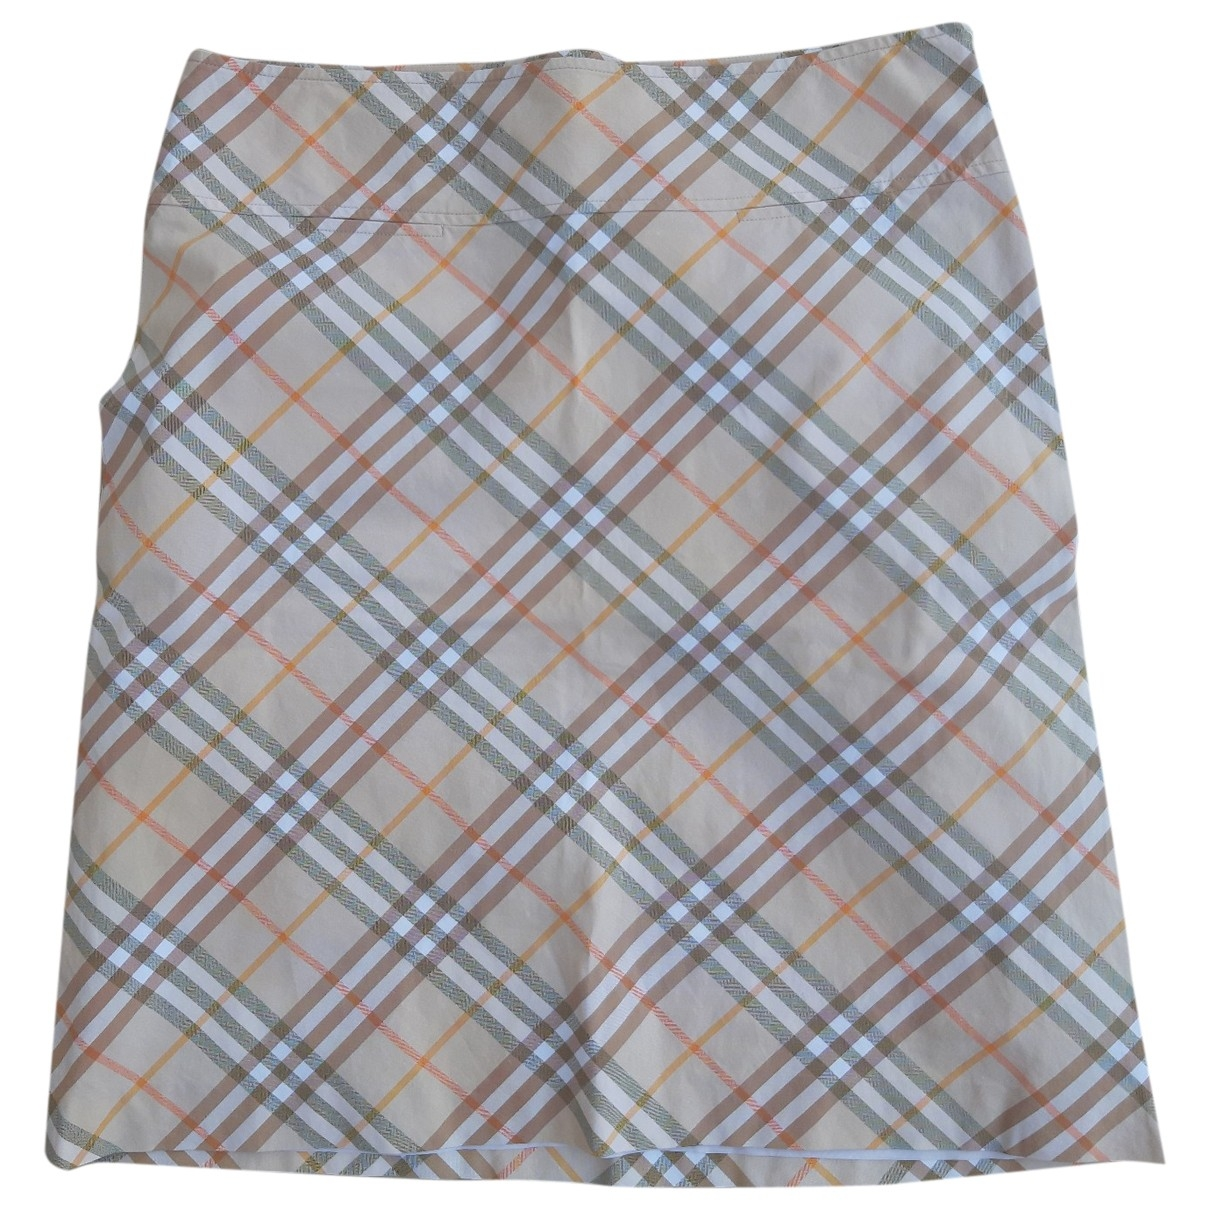 Burberry \N Beige Cotton skirt for Women 44 IT